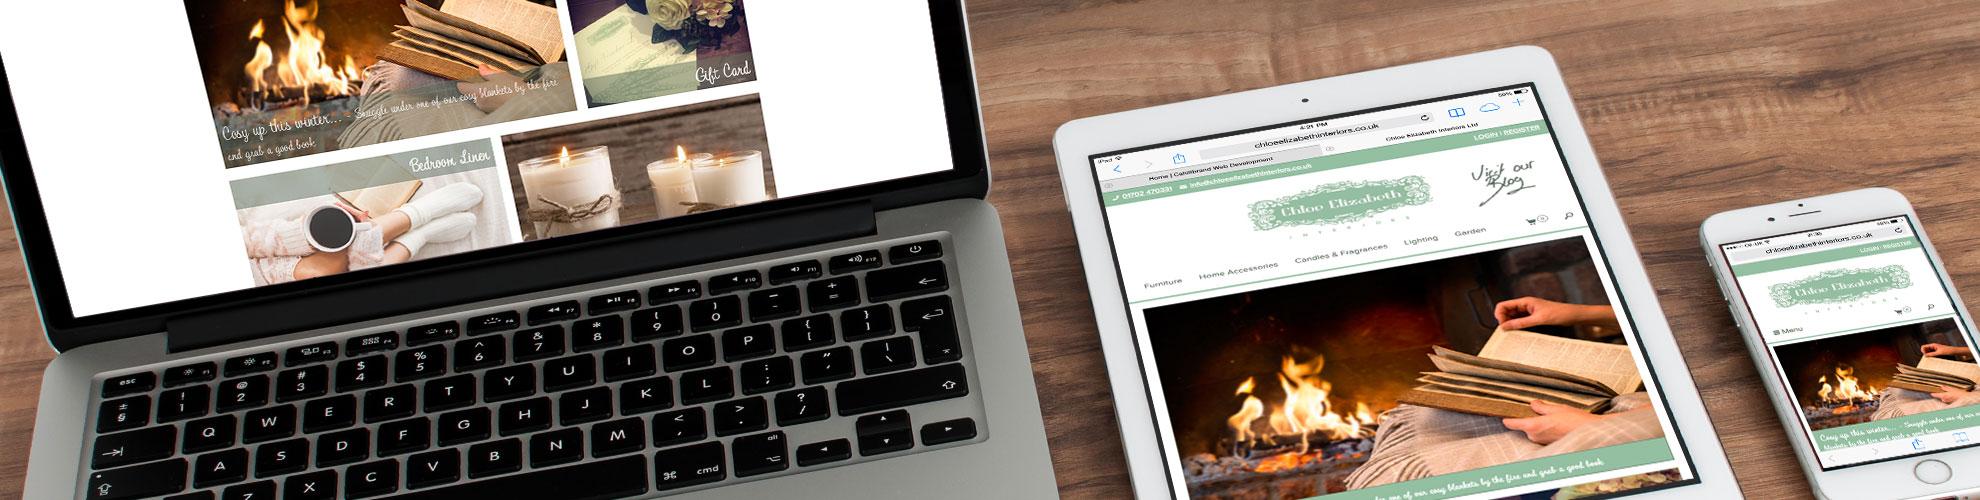 Chloe Elizabeth Interiors on MacBook, iPad and iPhone. Responsive as Standard.